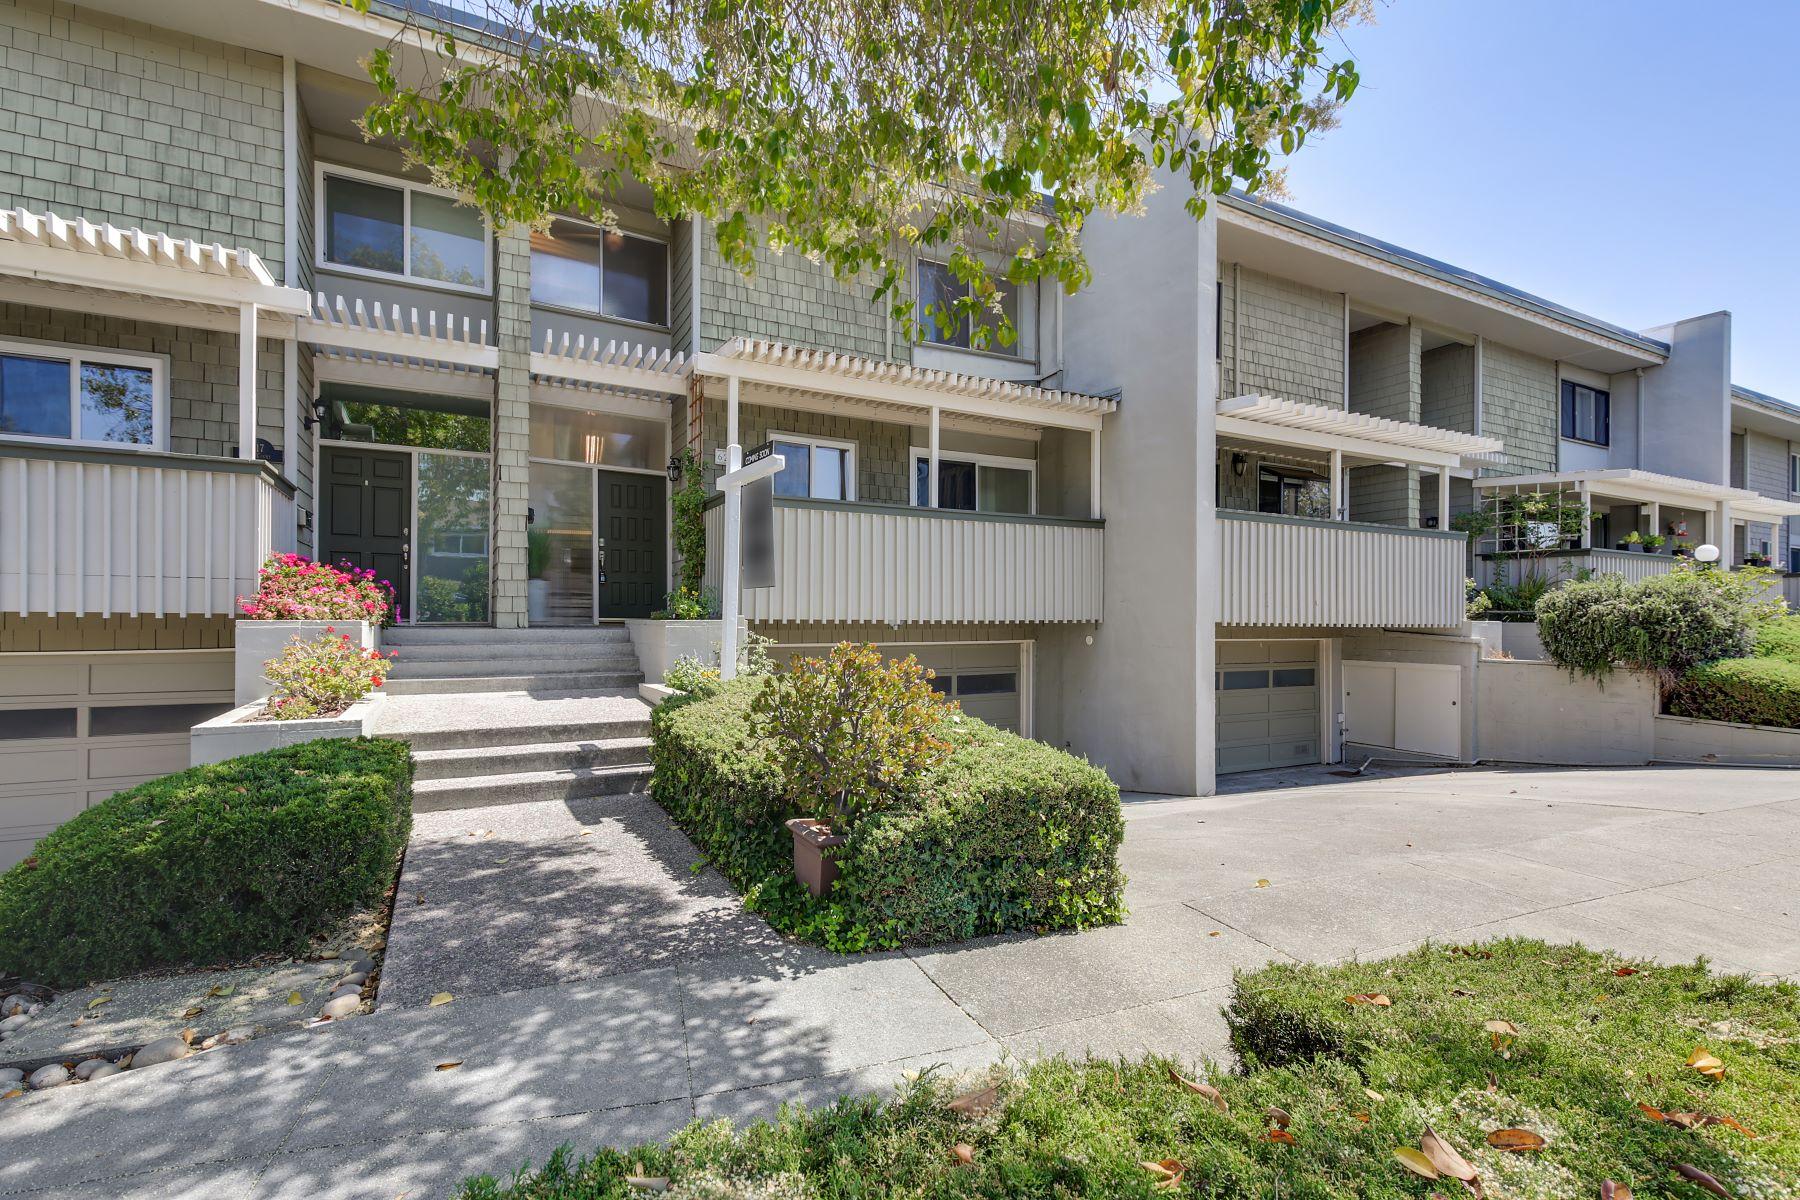 townhouses 为 销售 在 Spacious Townhome With High Ceilings 629 E Fox Ct 雷德伍德城, 加利福尼亚州 94061 美国